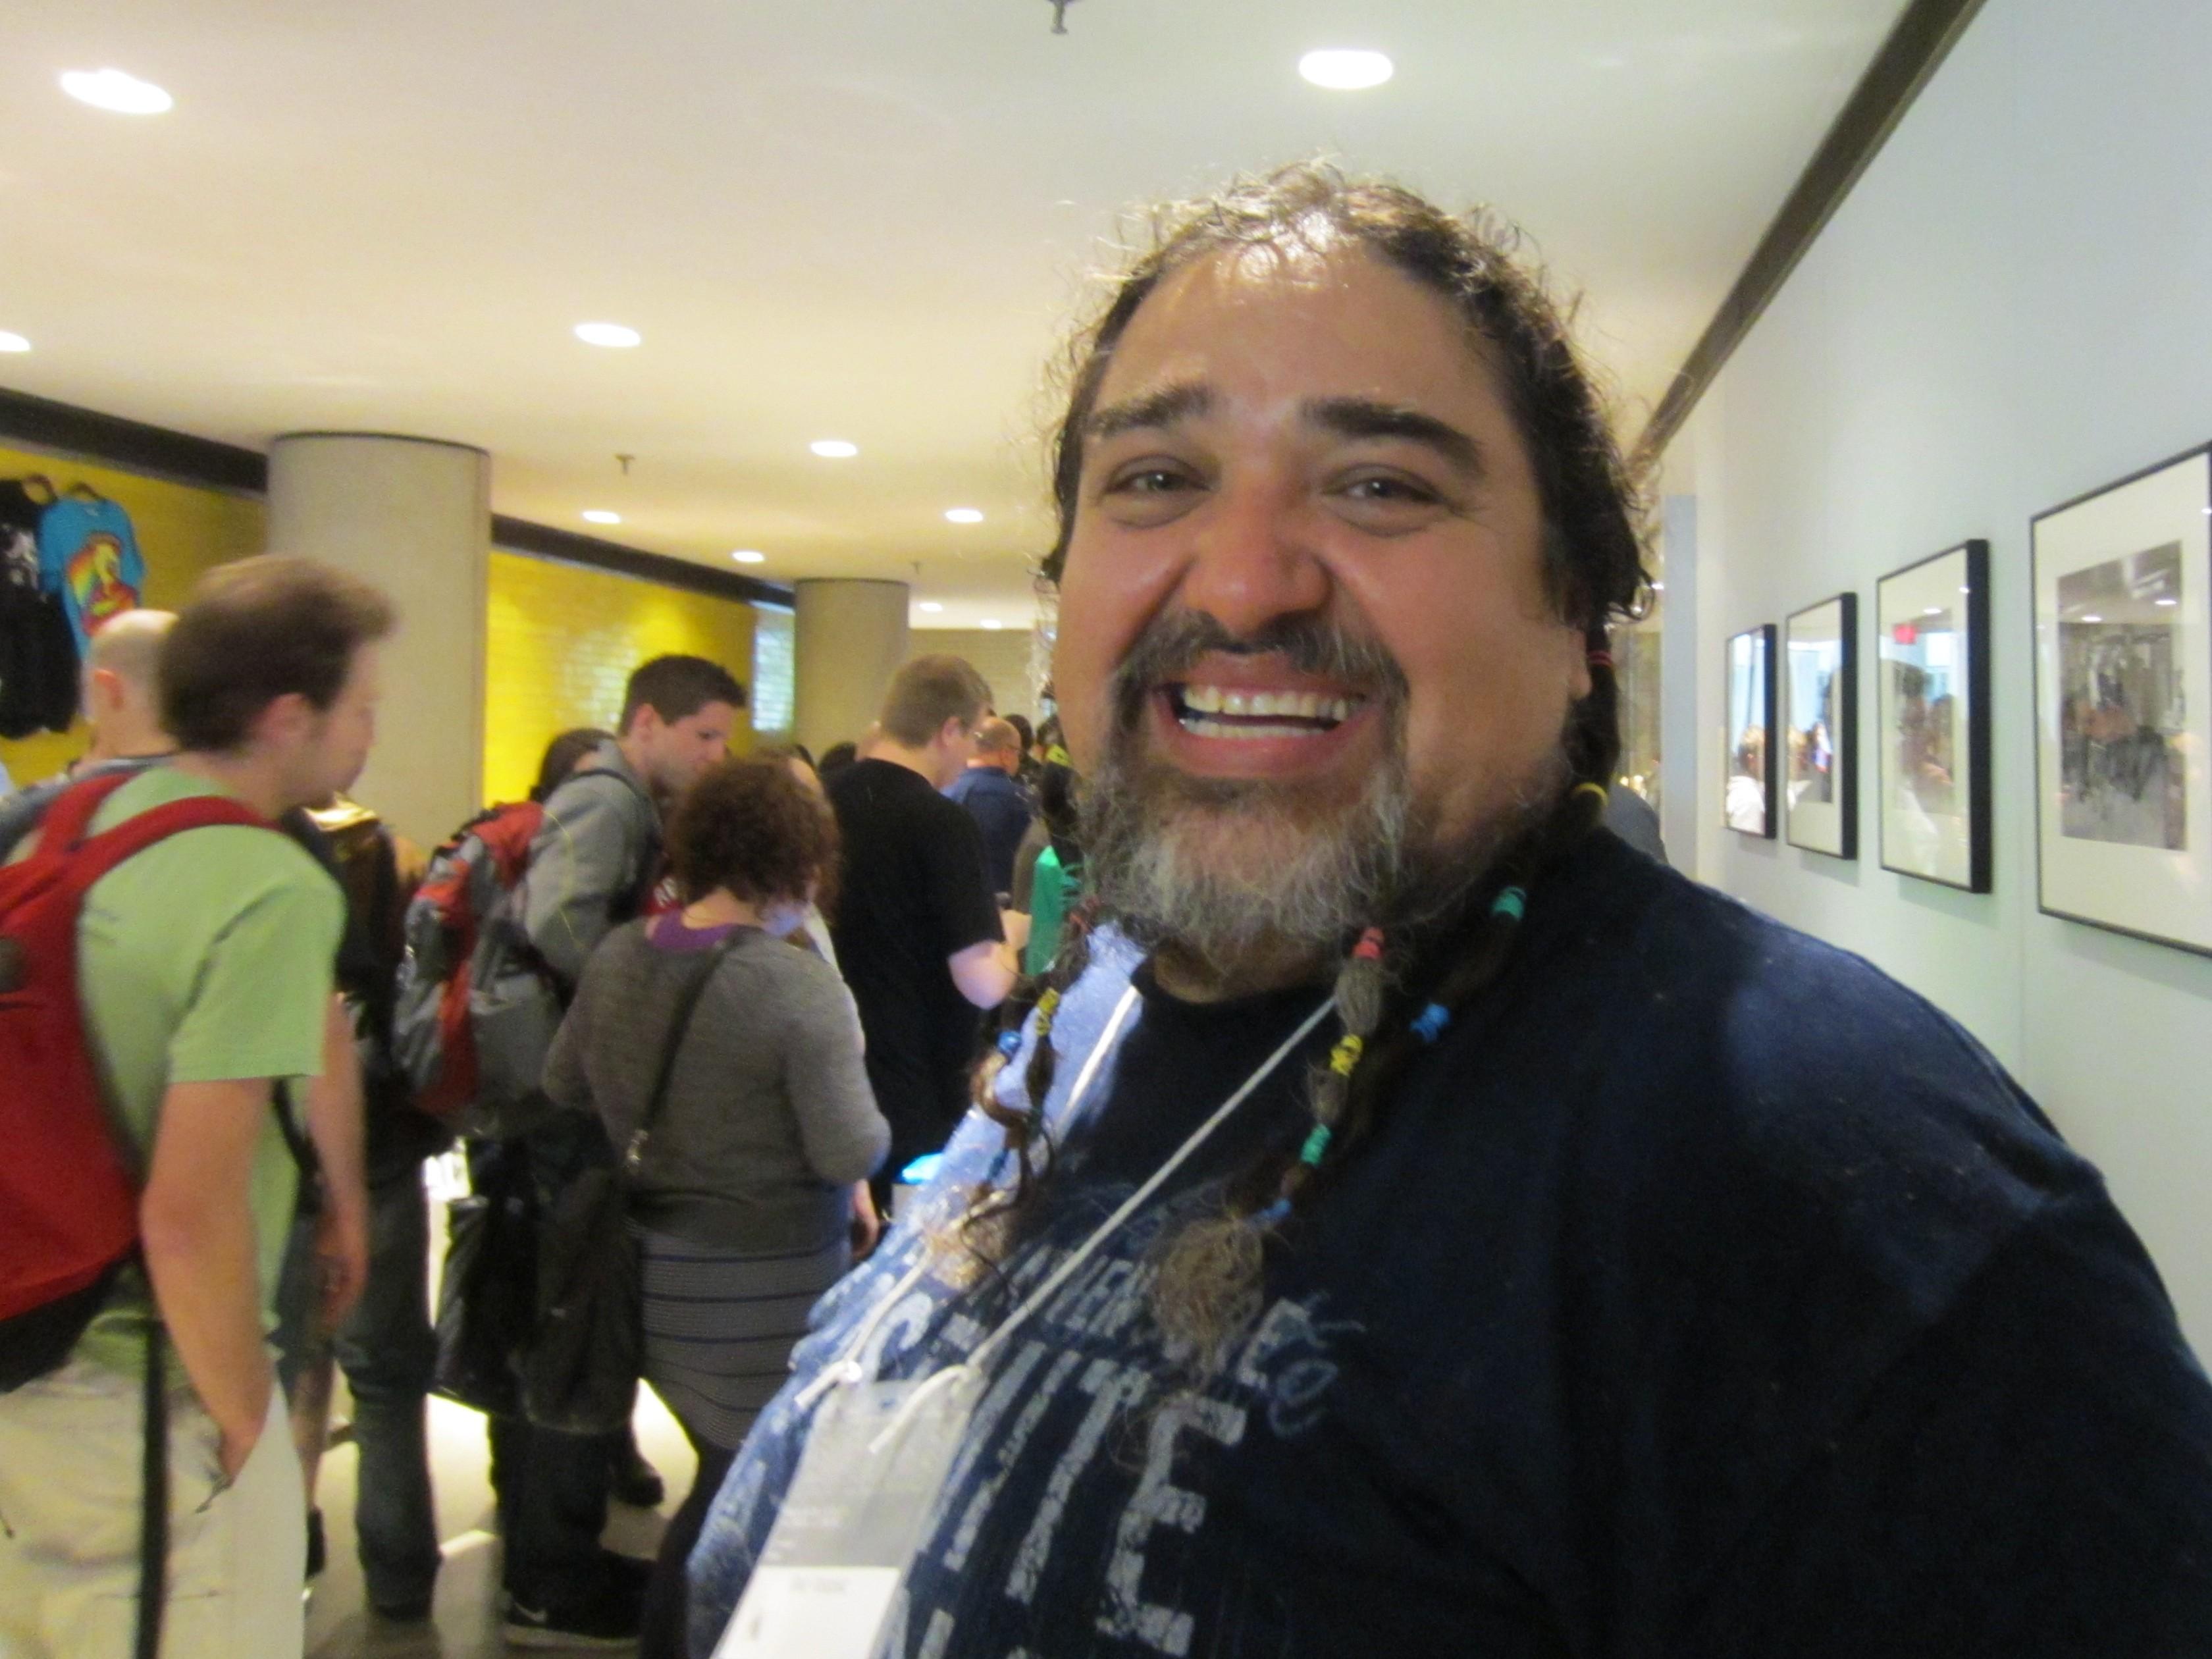 Double Rainbow Guy, aka Paul Vasquez, at ROFLCon 2012